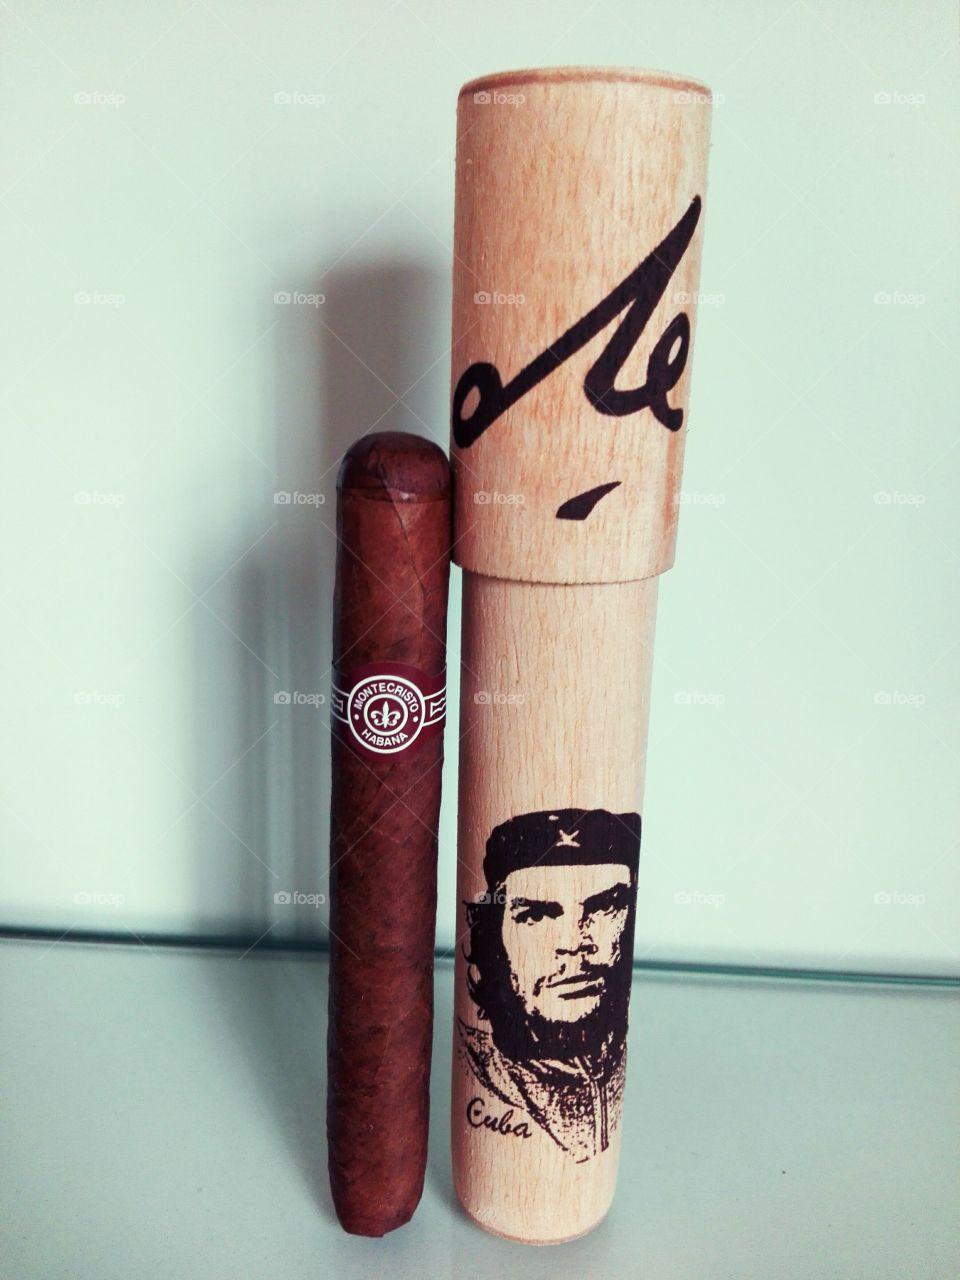 Montecrisro cigar